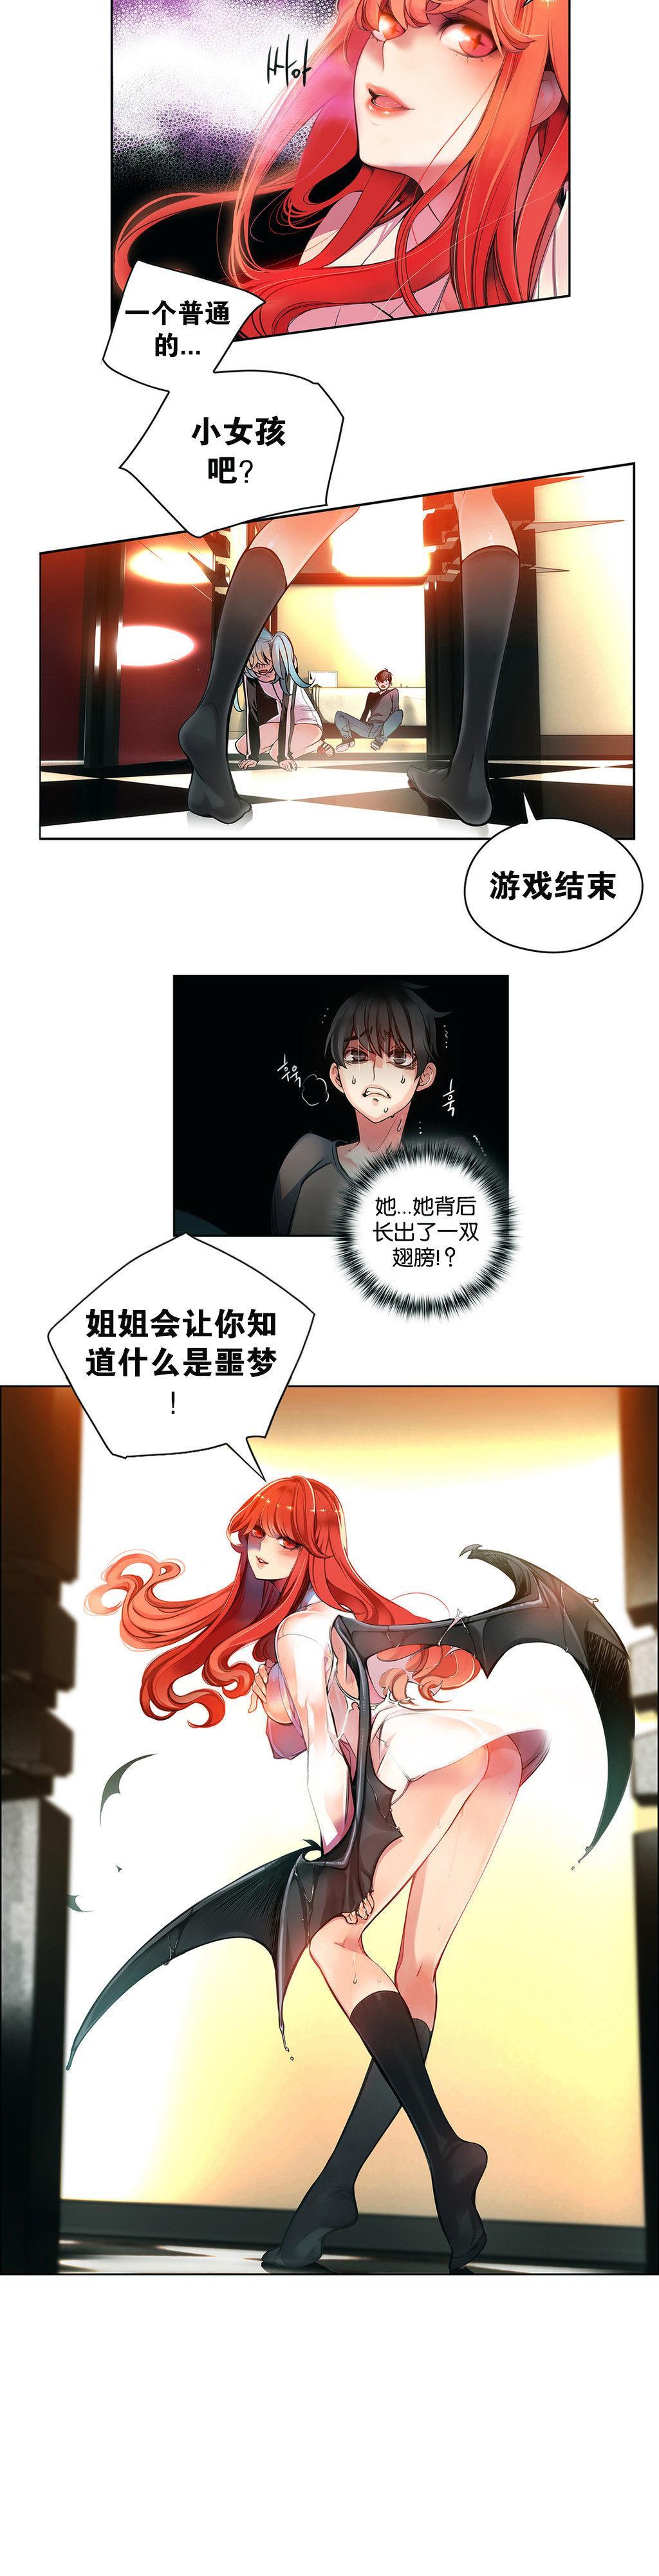 Lilith`s Cord Ch.1-10 55